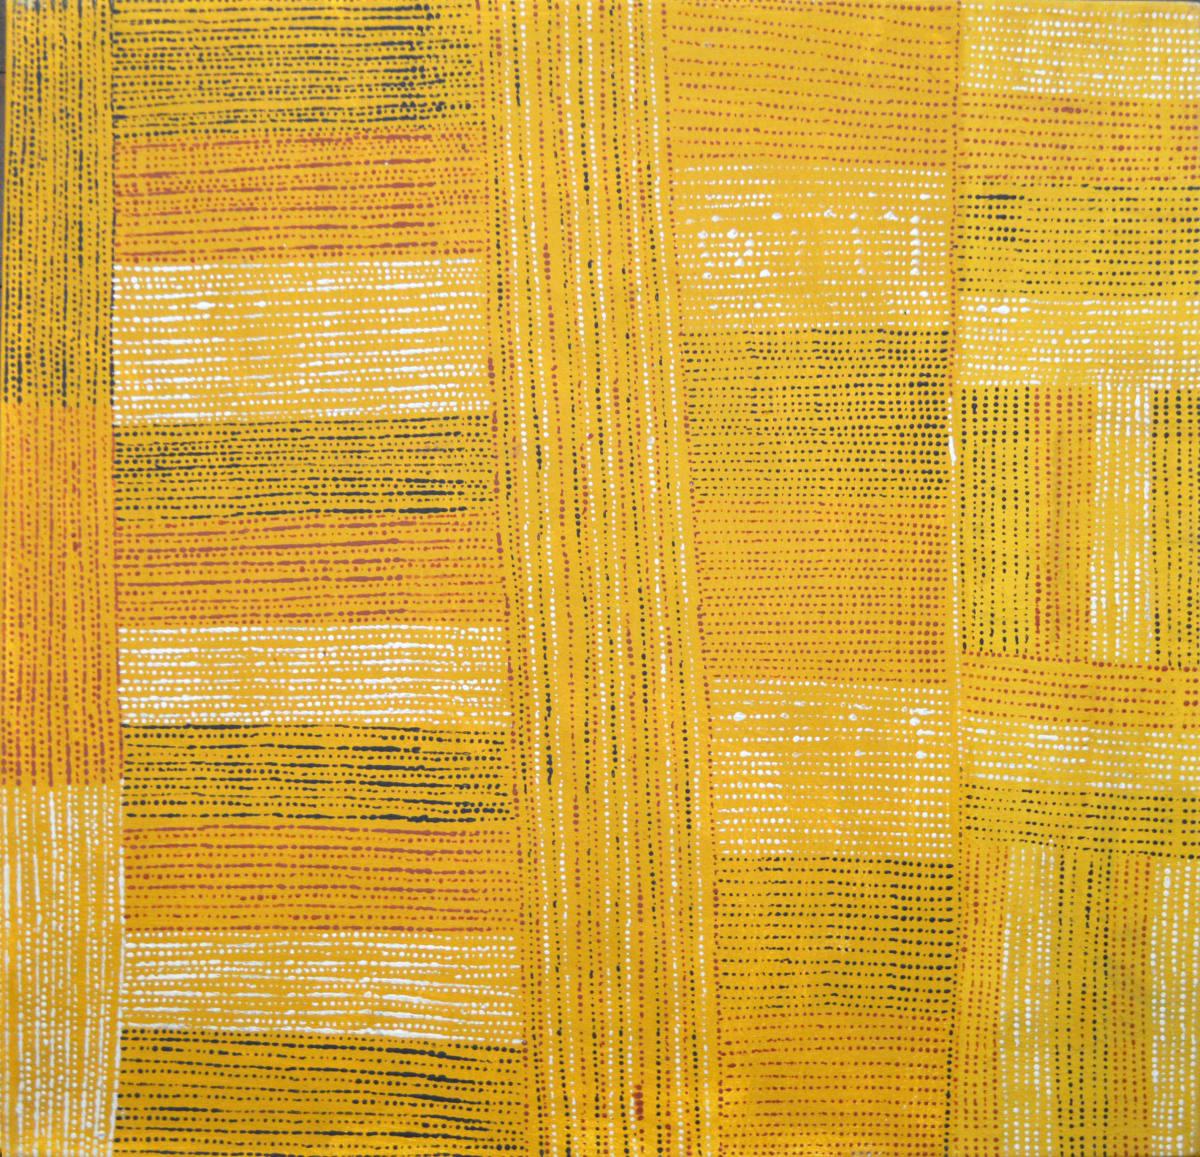 Agatina Black Jilamara natural ochres on canvas 70 x 70 cm